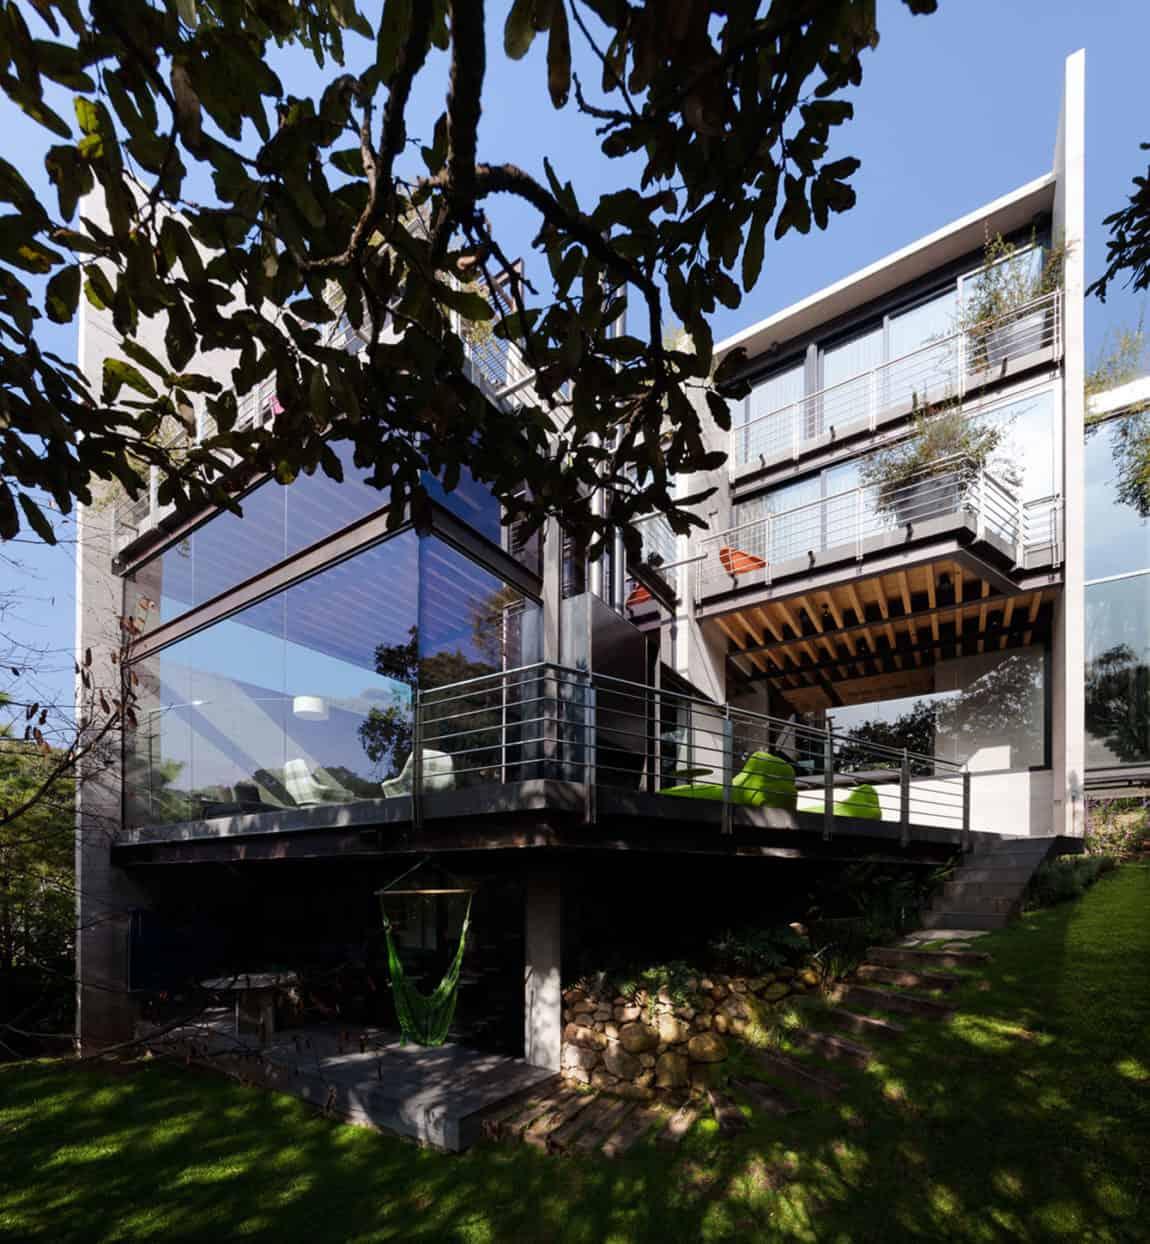 Tepozcuautla House by grupoarquitectura (1)